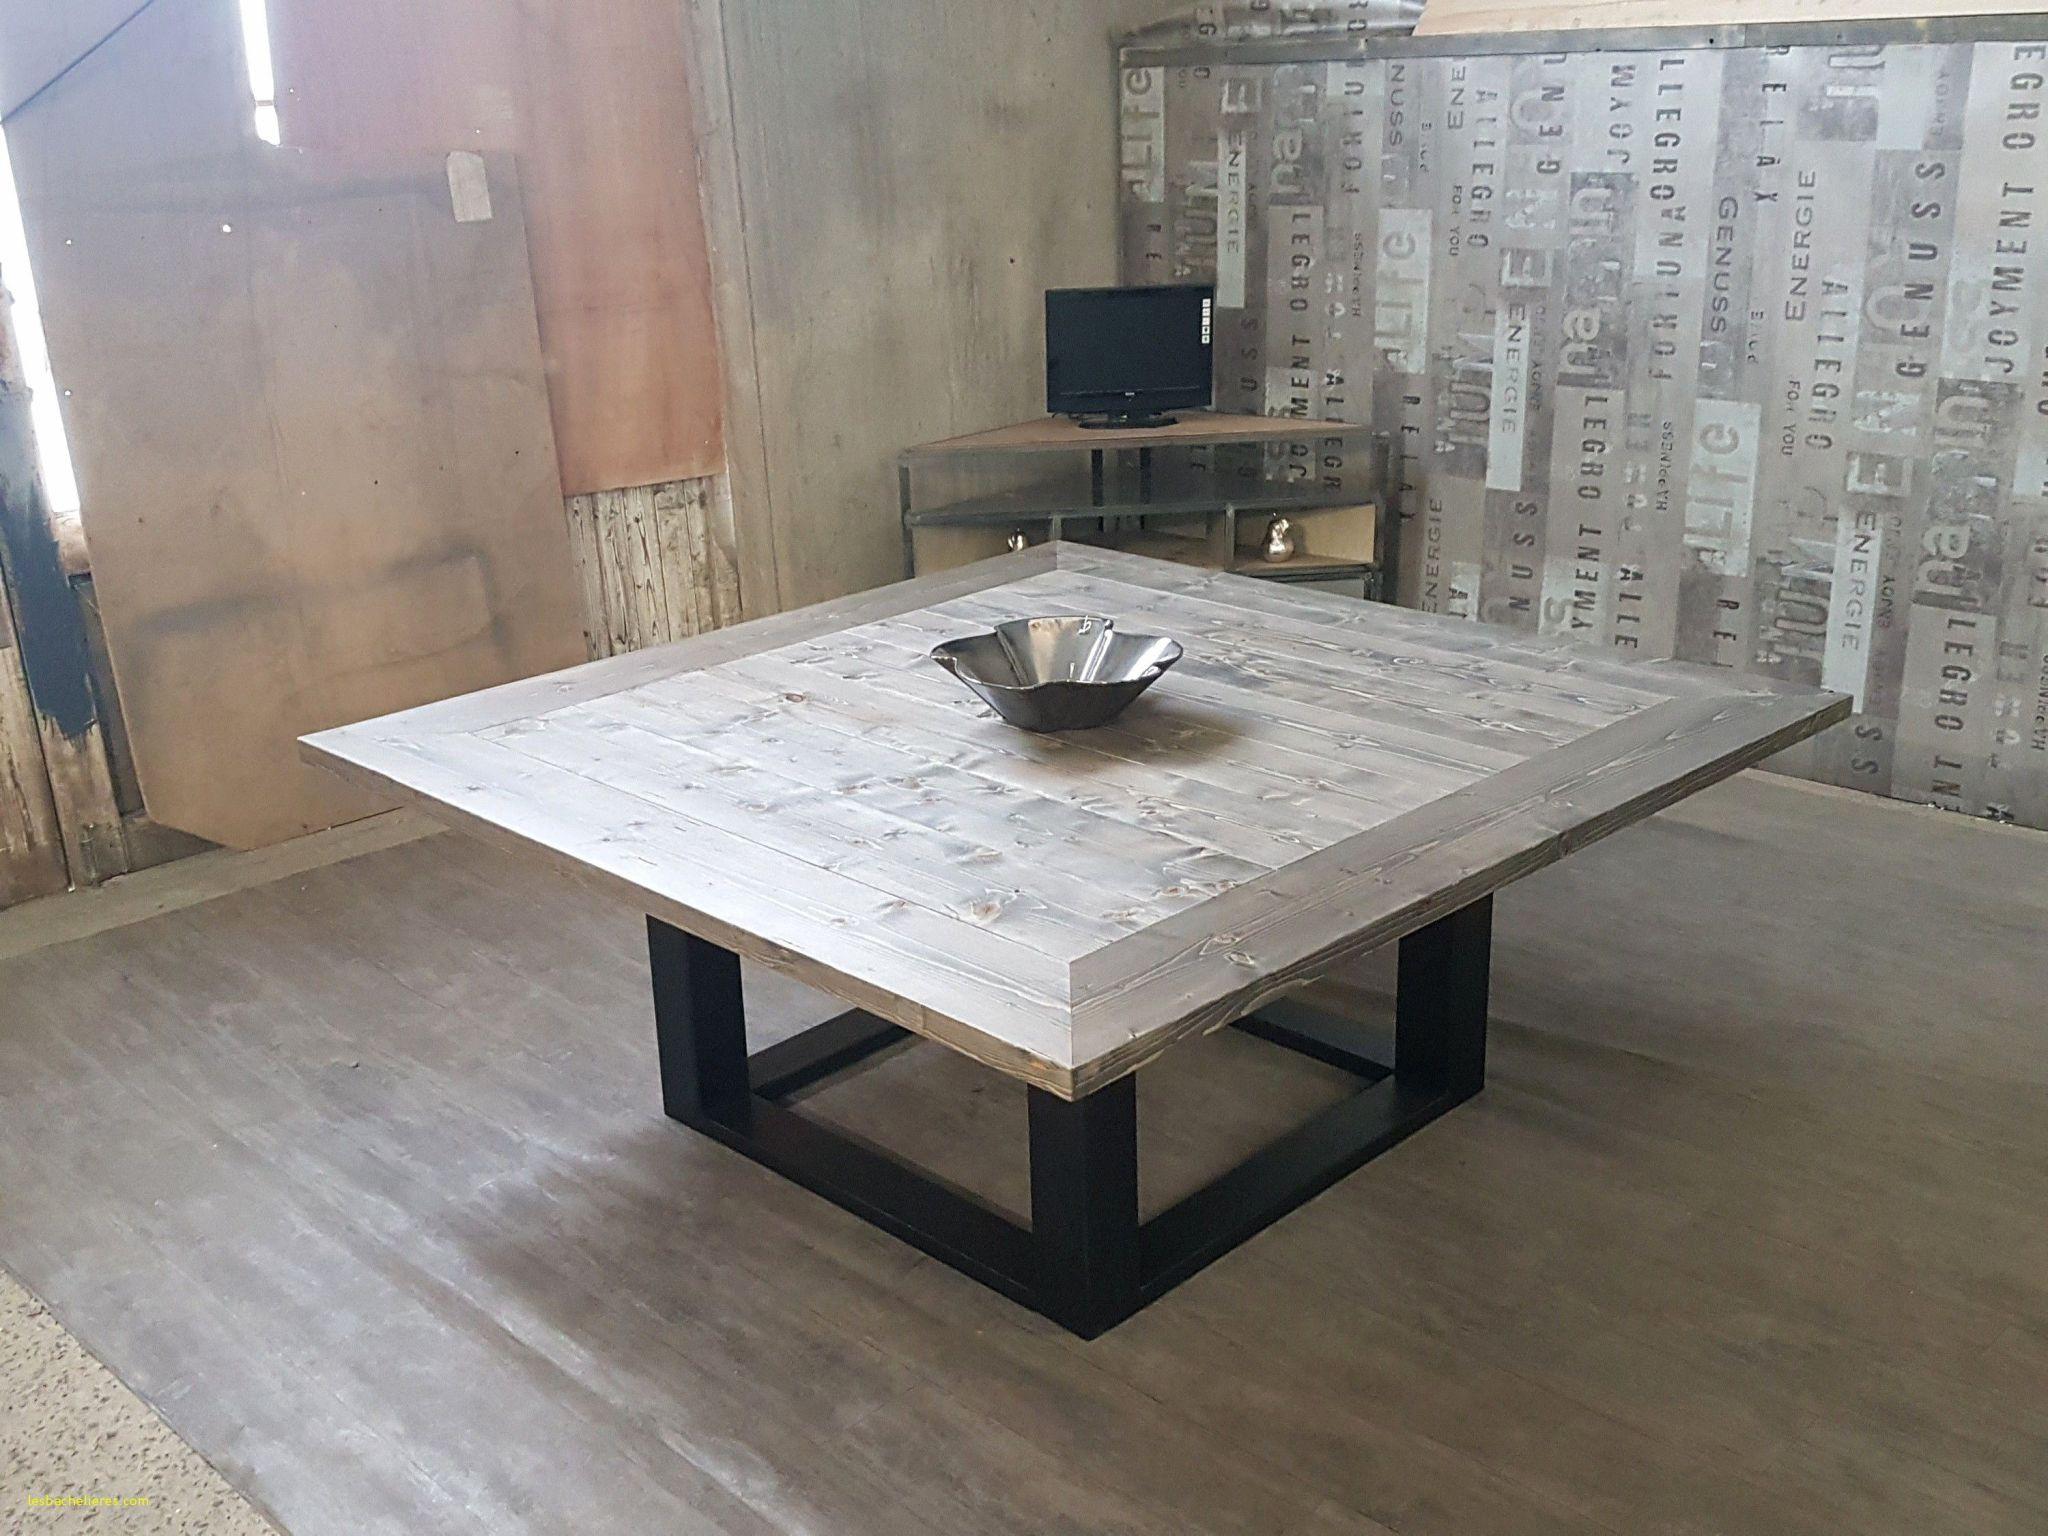 table de jardin carree 8 personnes table jardin carree 12 personnes recursiveuniverse conception de of table de jardin carree 8 personnes 4